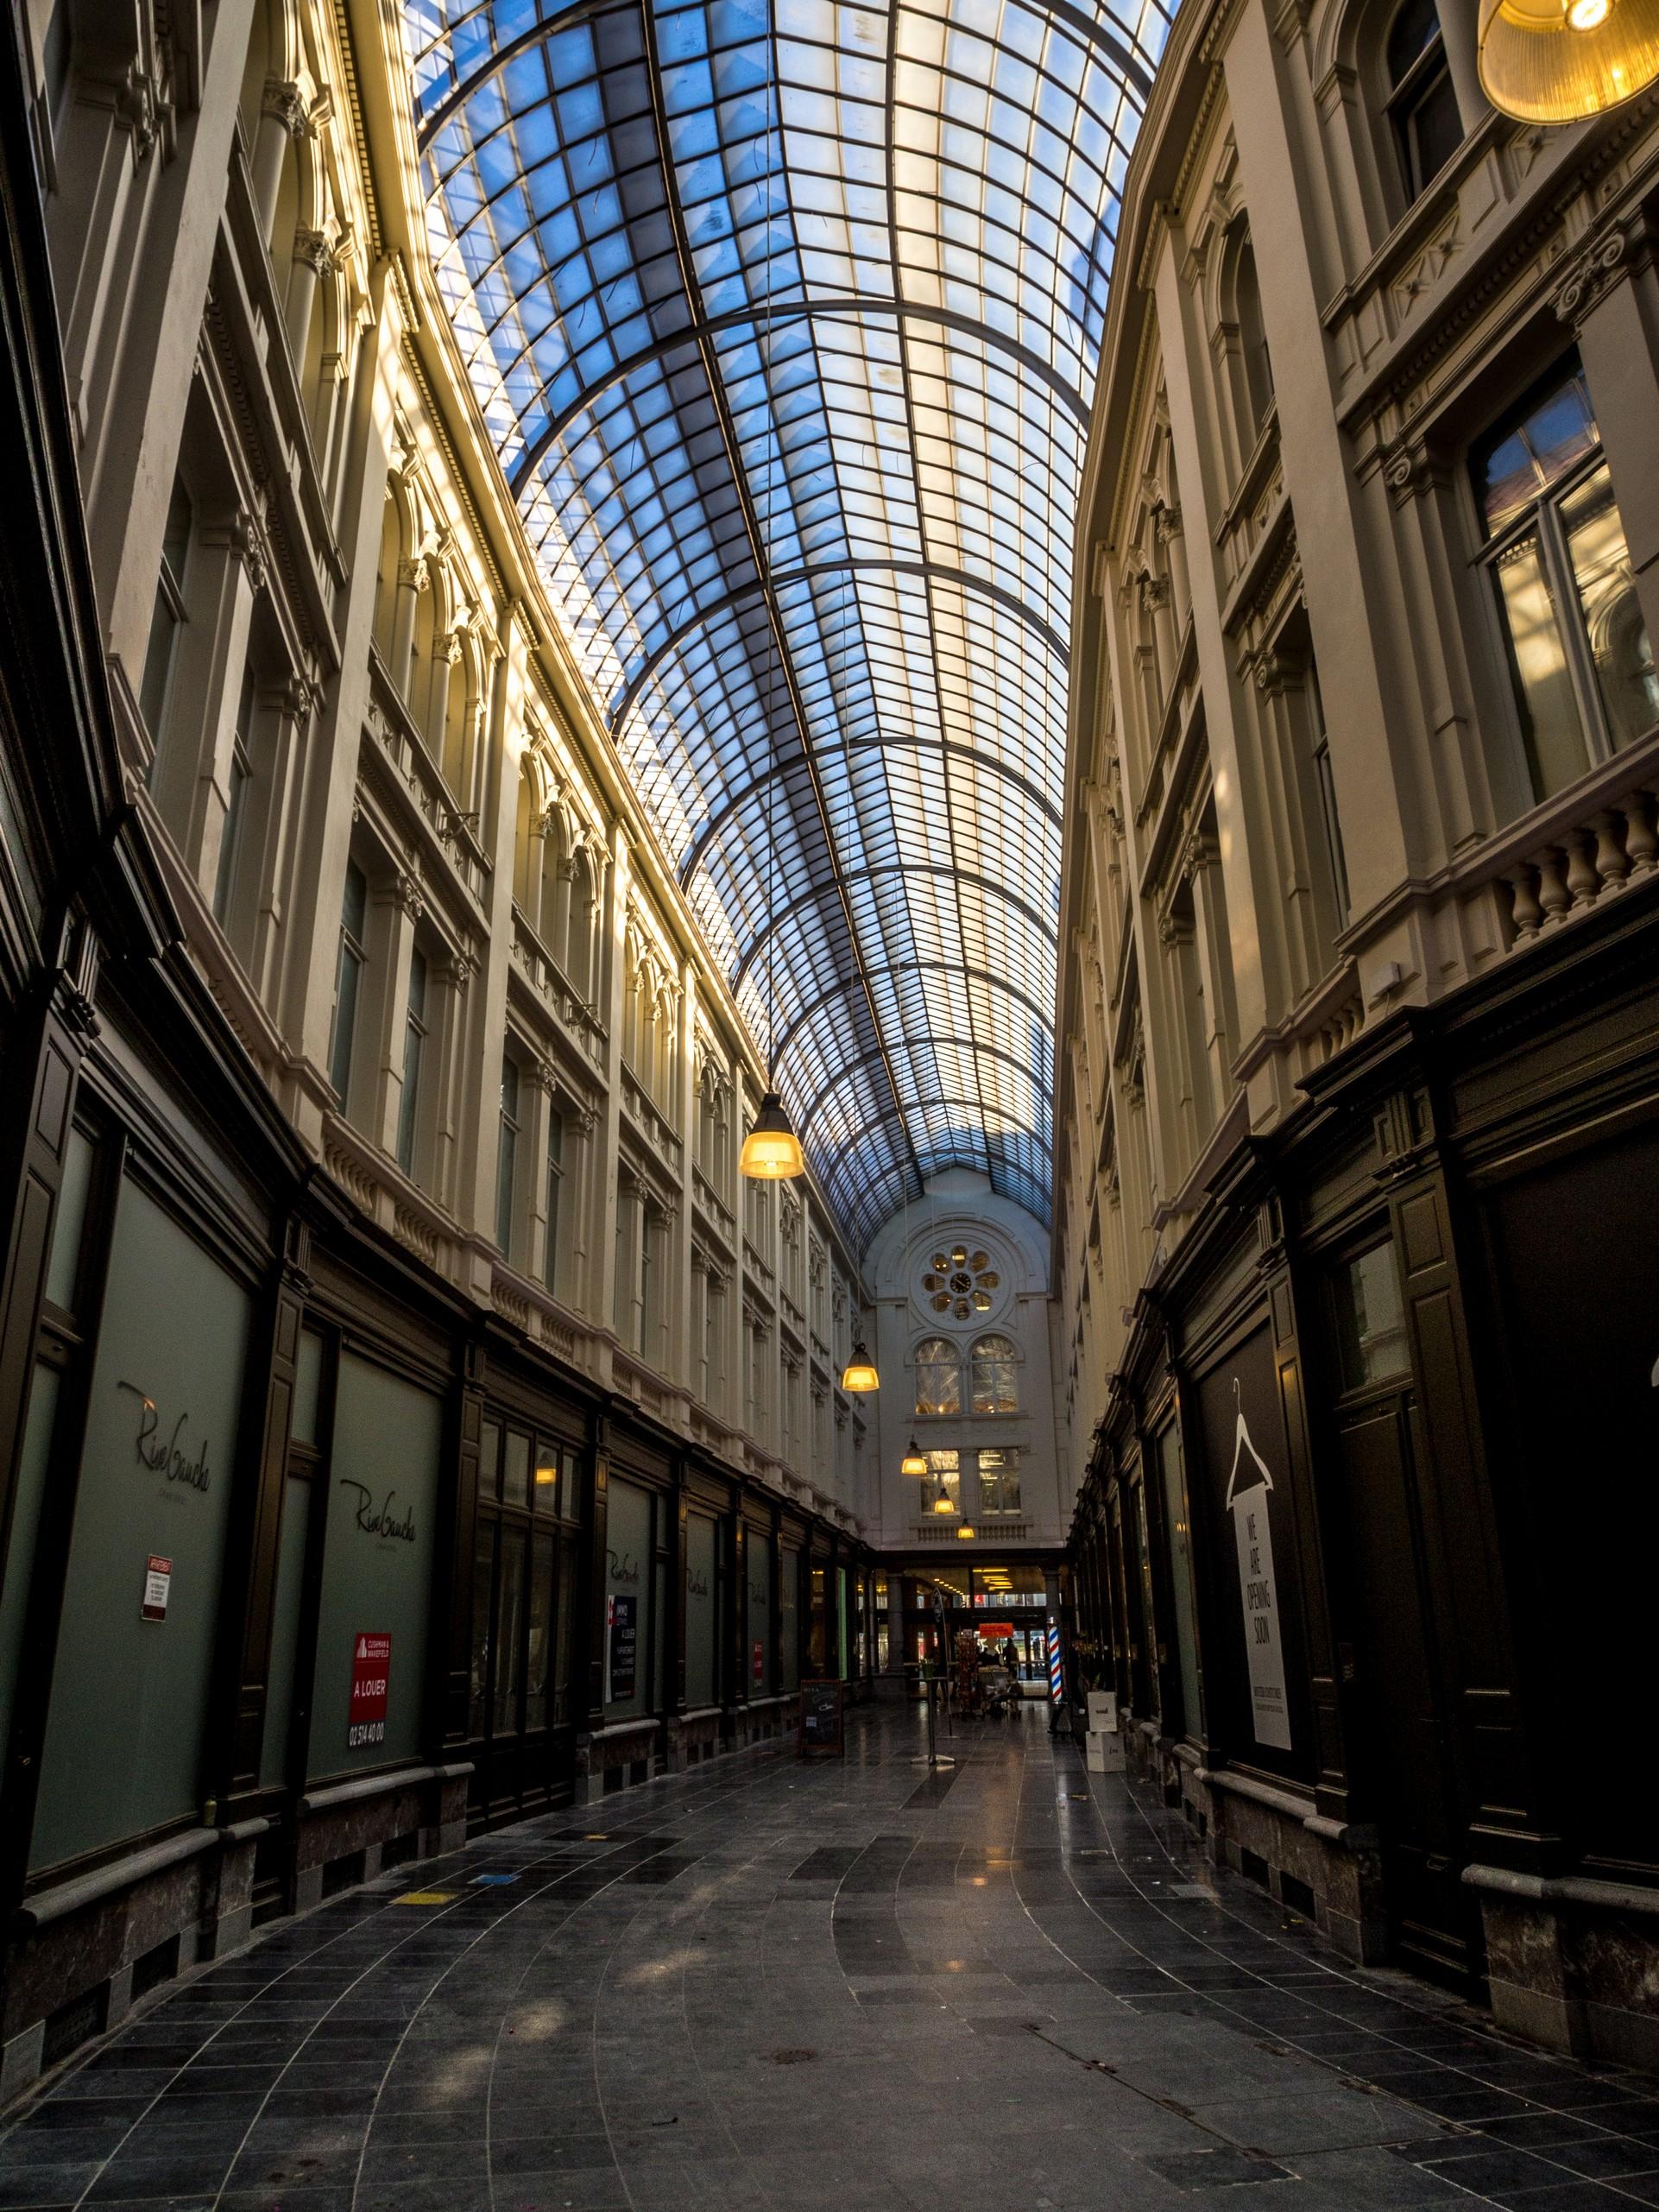 Passage de la Bourse, Charleroi